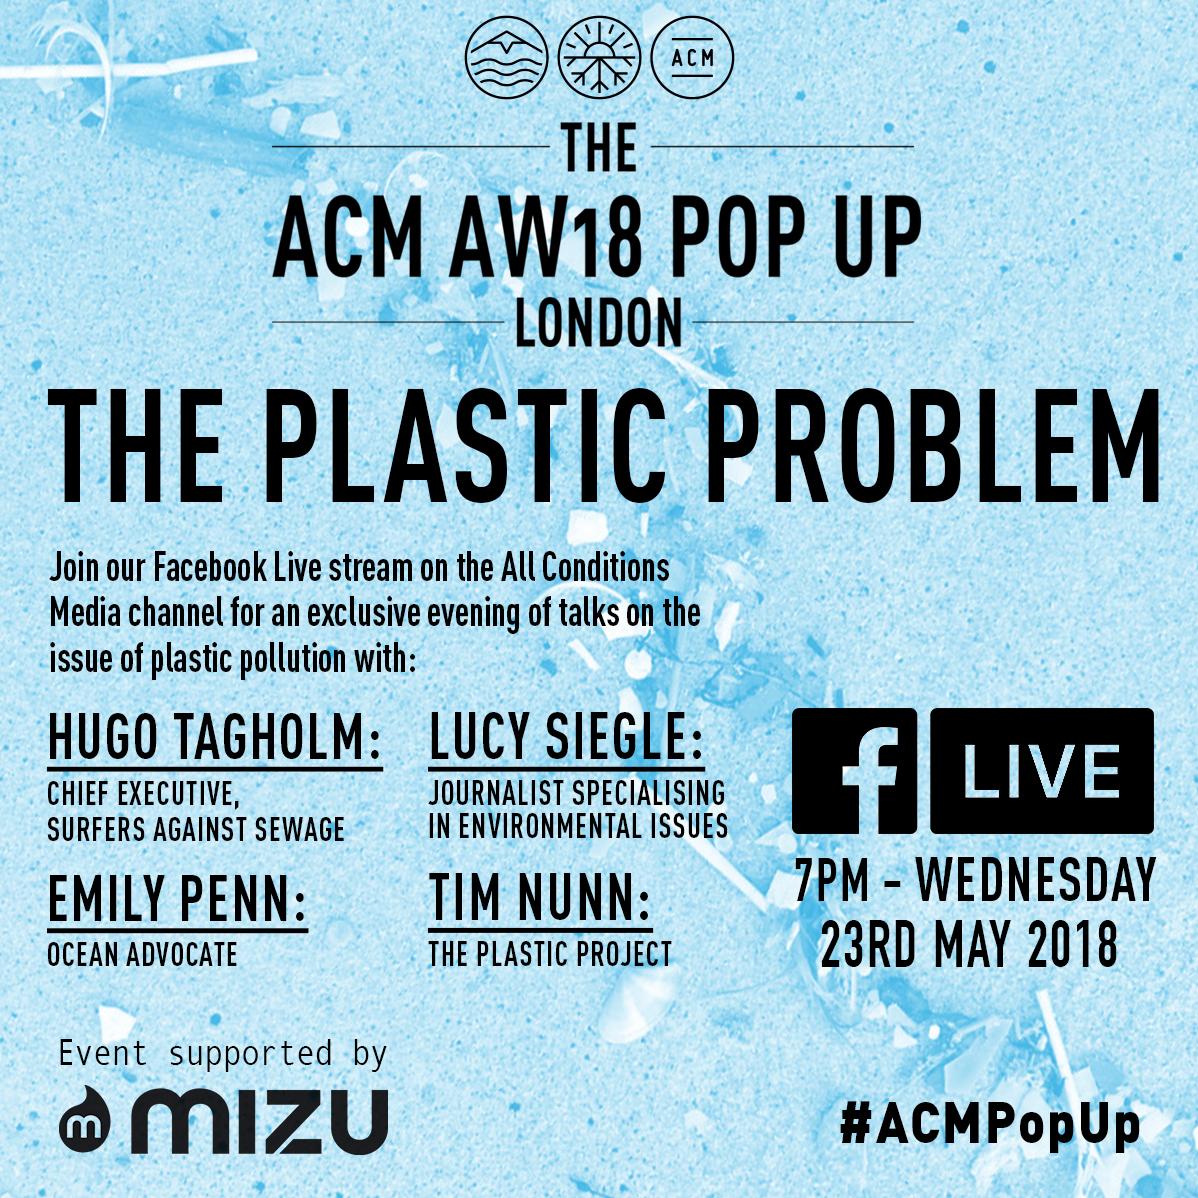 plastic-problem-FB-LIVE-post